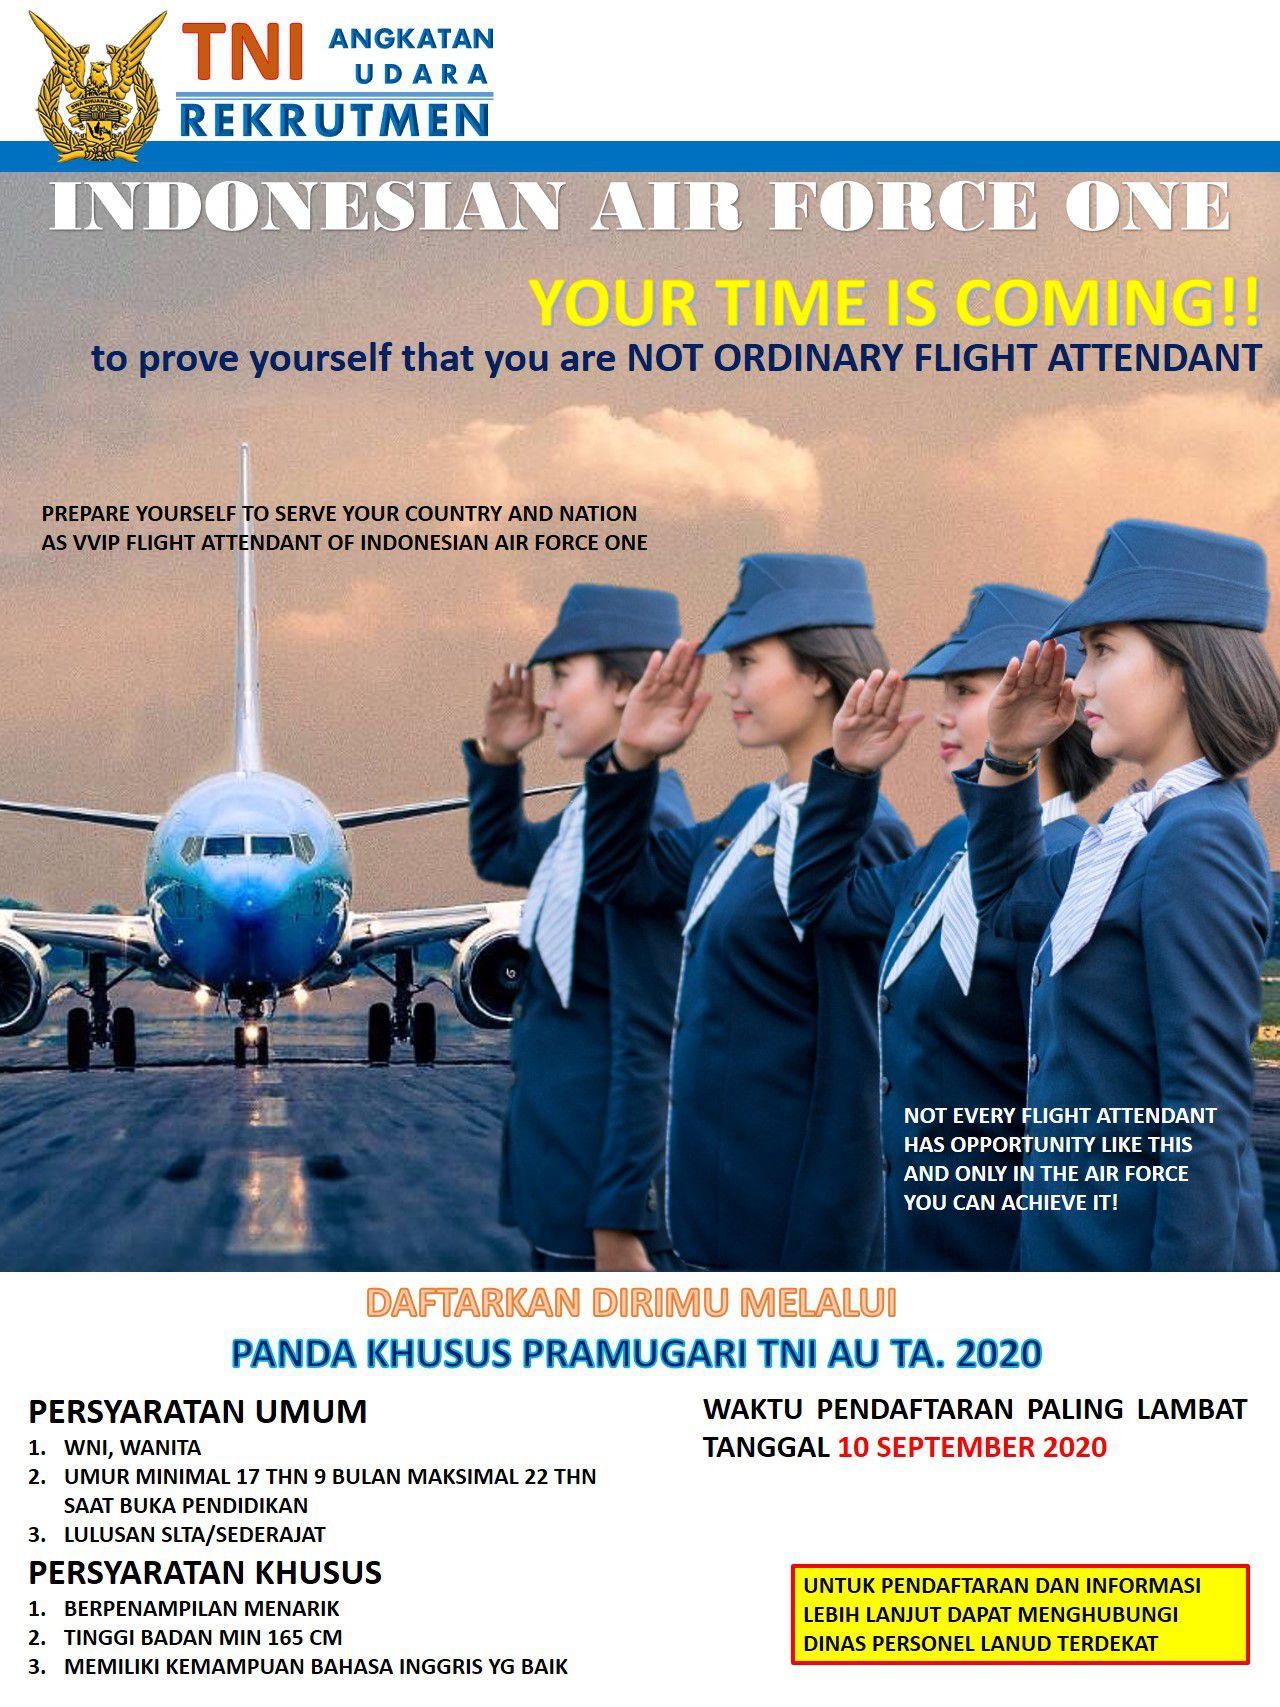 Rekrutmen Calon Panda Khusus TNI Angkatan Udara TA 2020 Minimal SLTA Sederajat